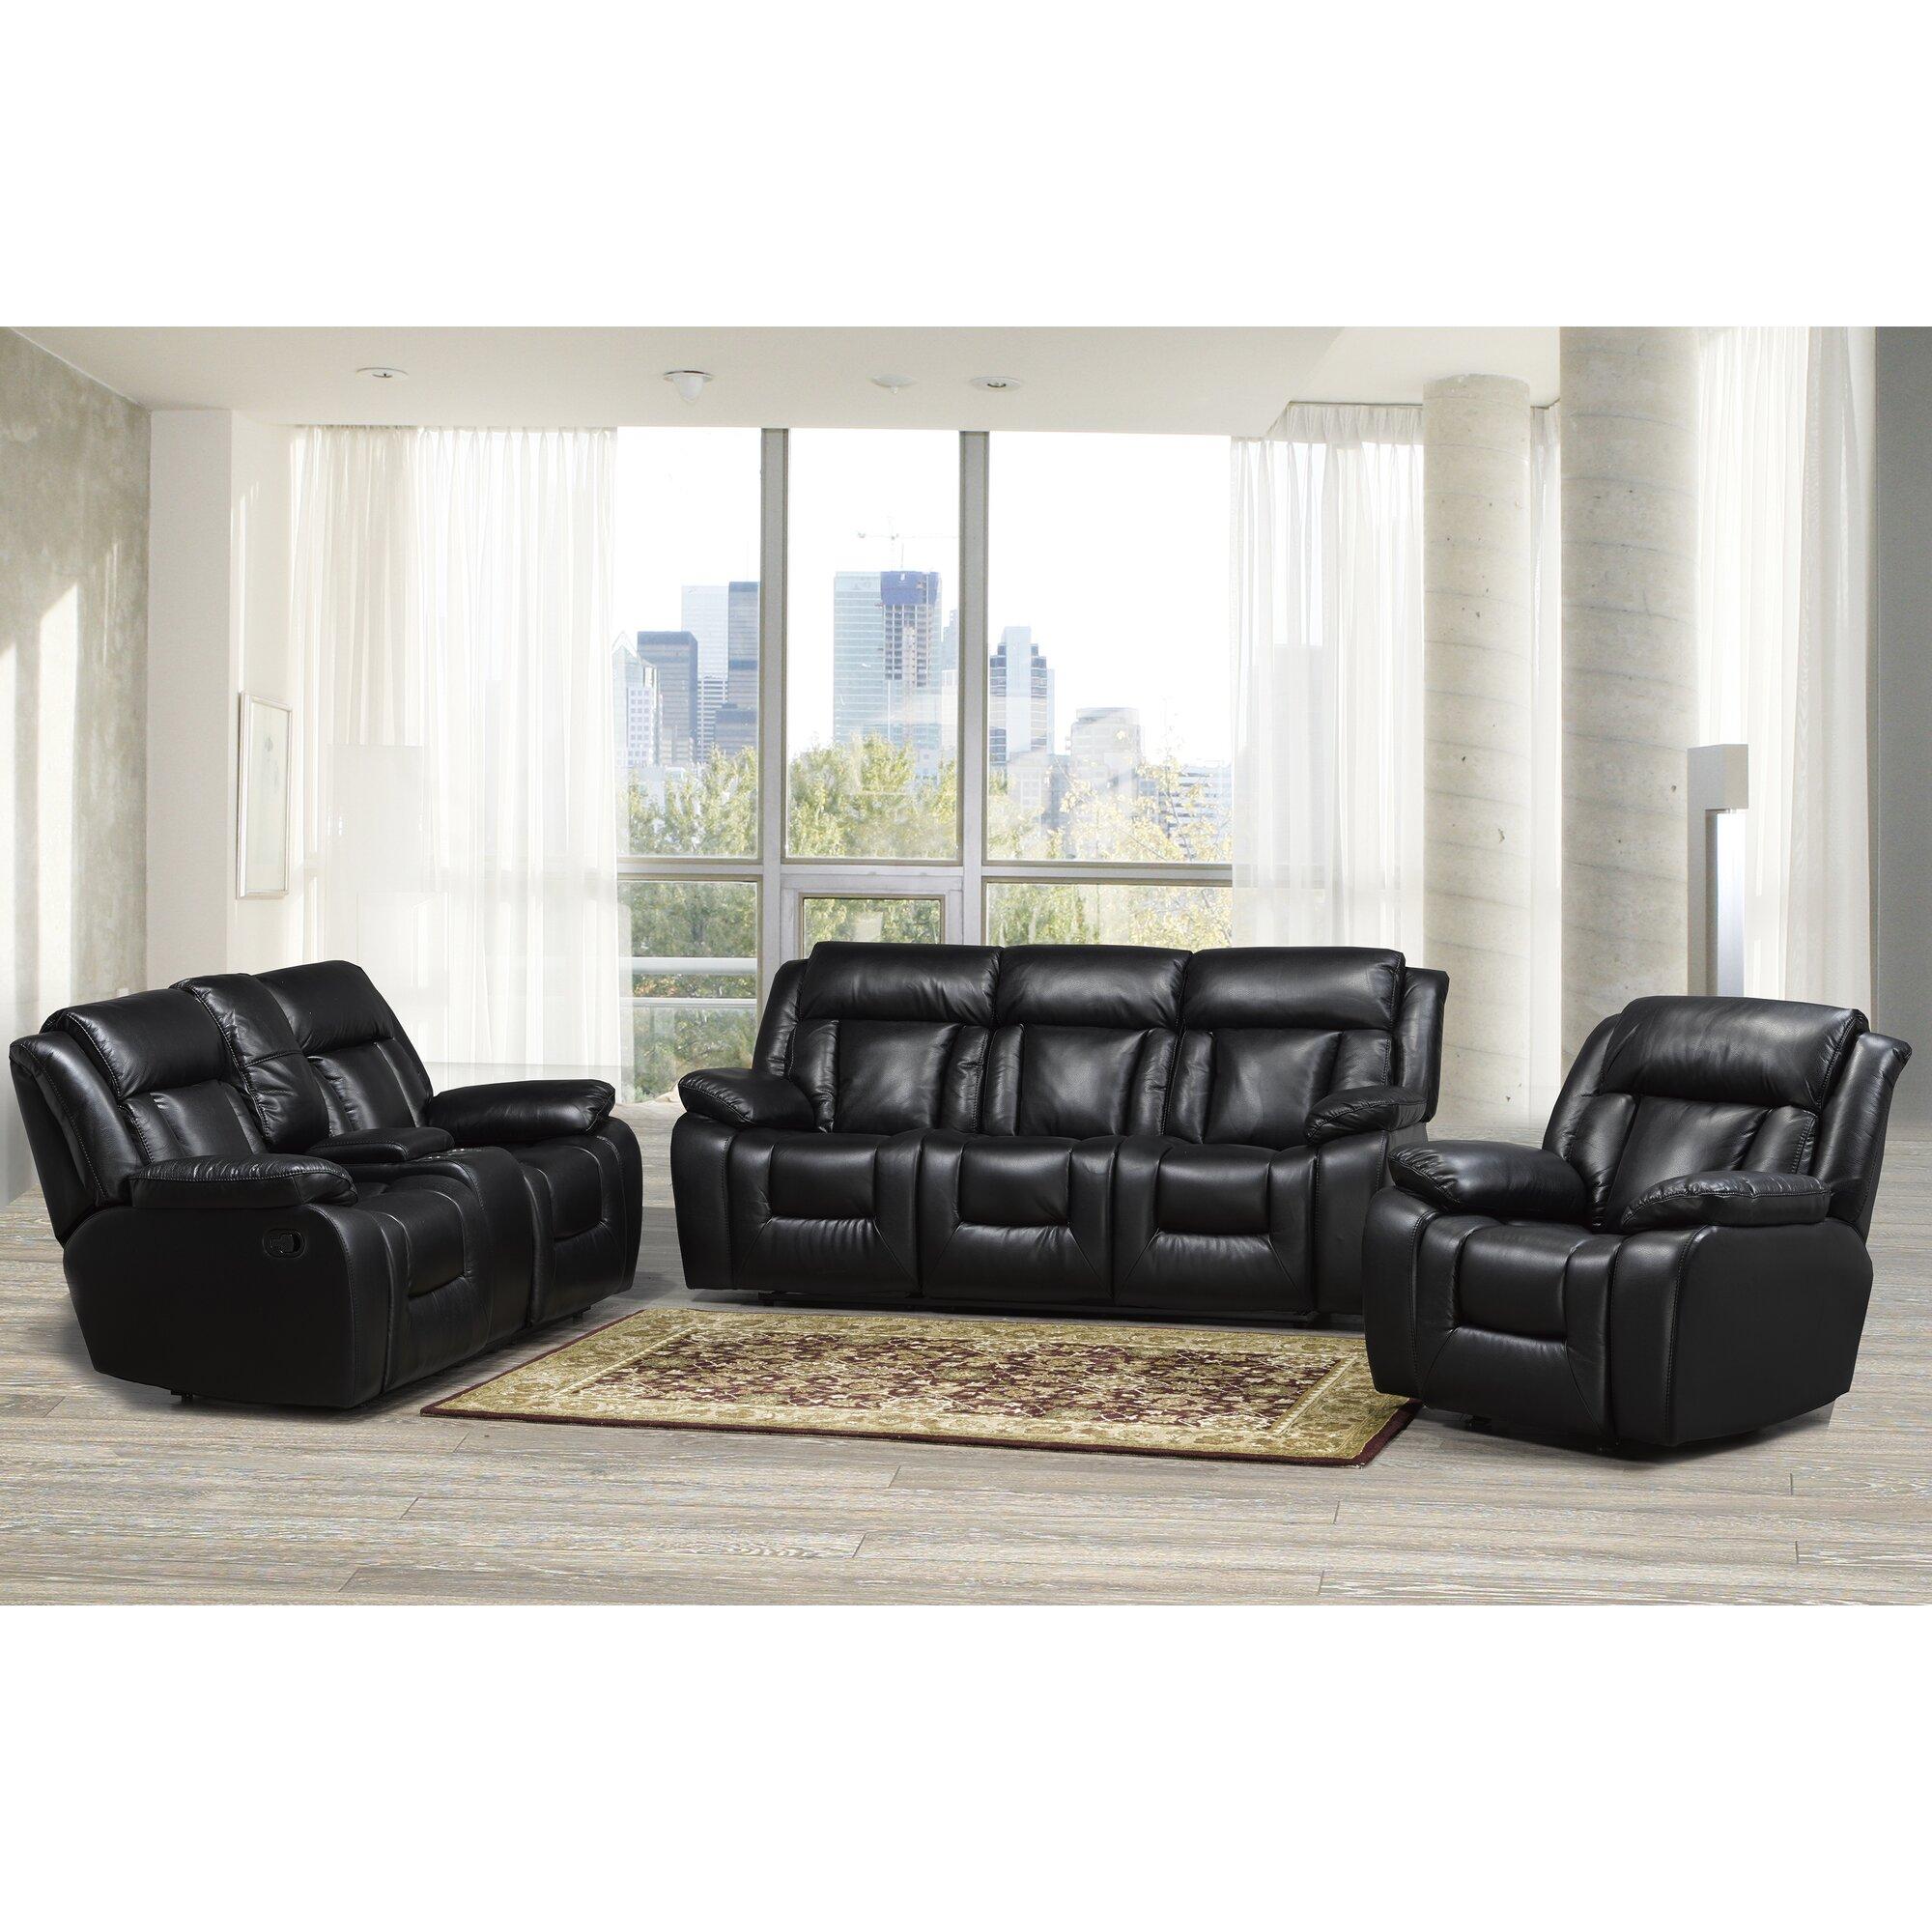 Red Barrel Studio Arcadia 3 Piece Leather Recliner Living Room Set